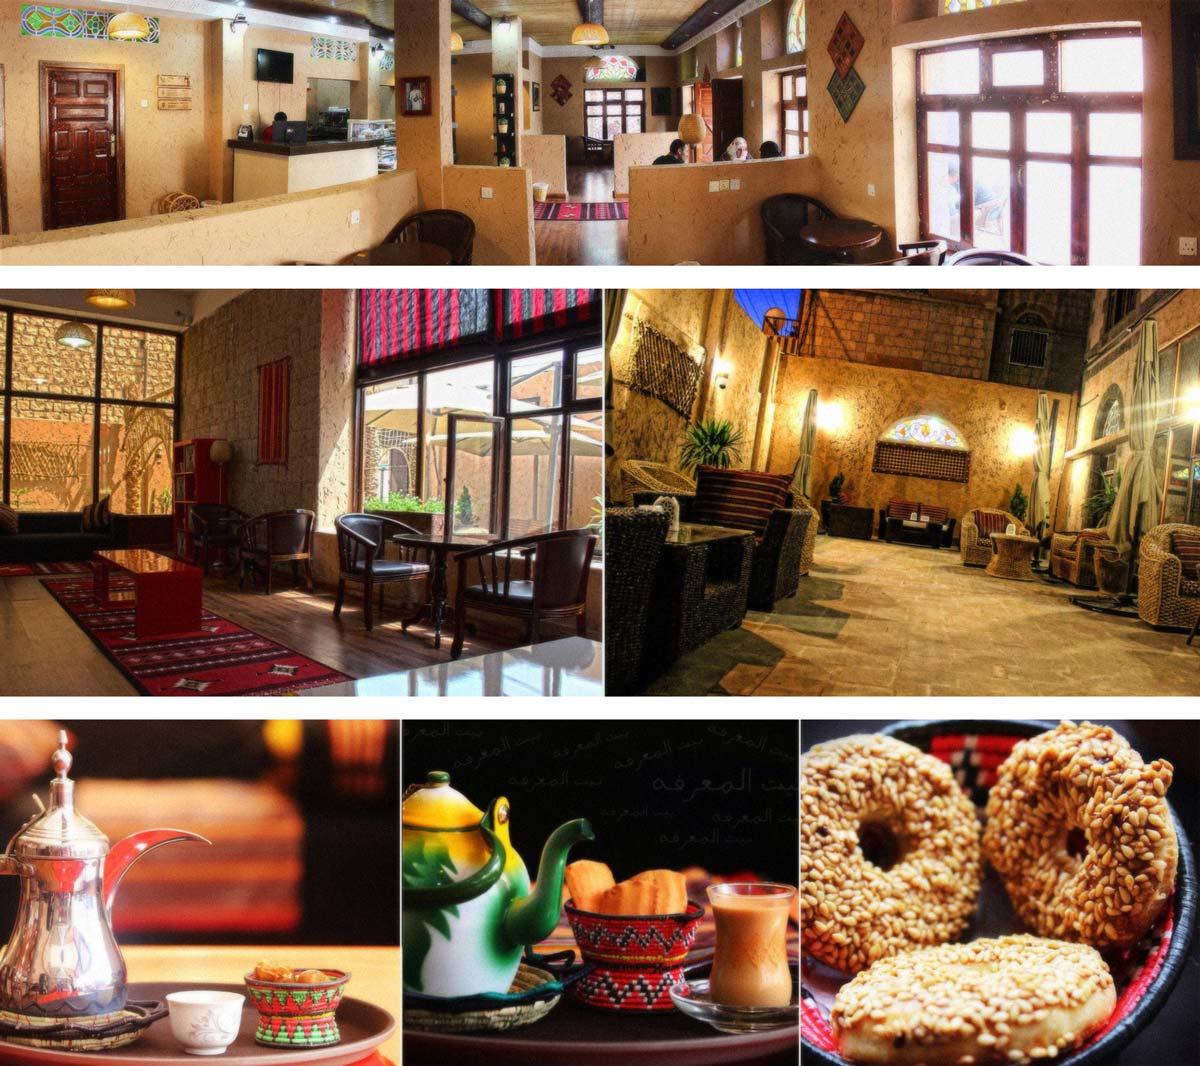 Photos from Bait Almarefa - Photo credit: Bait Almarefa